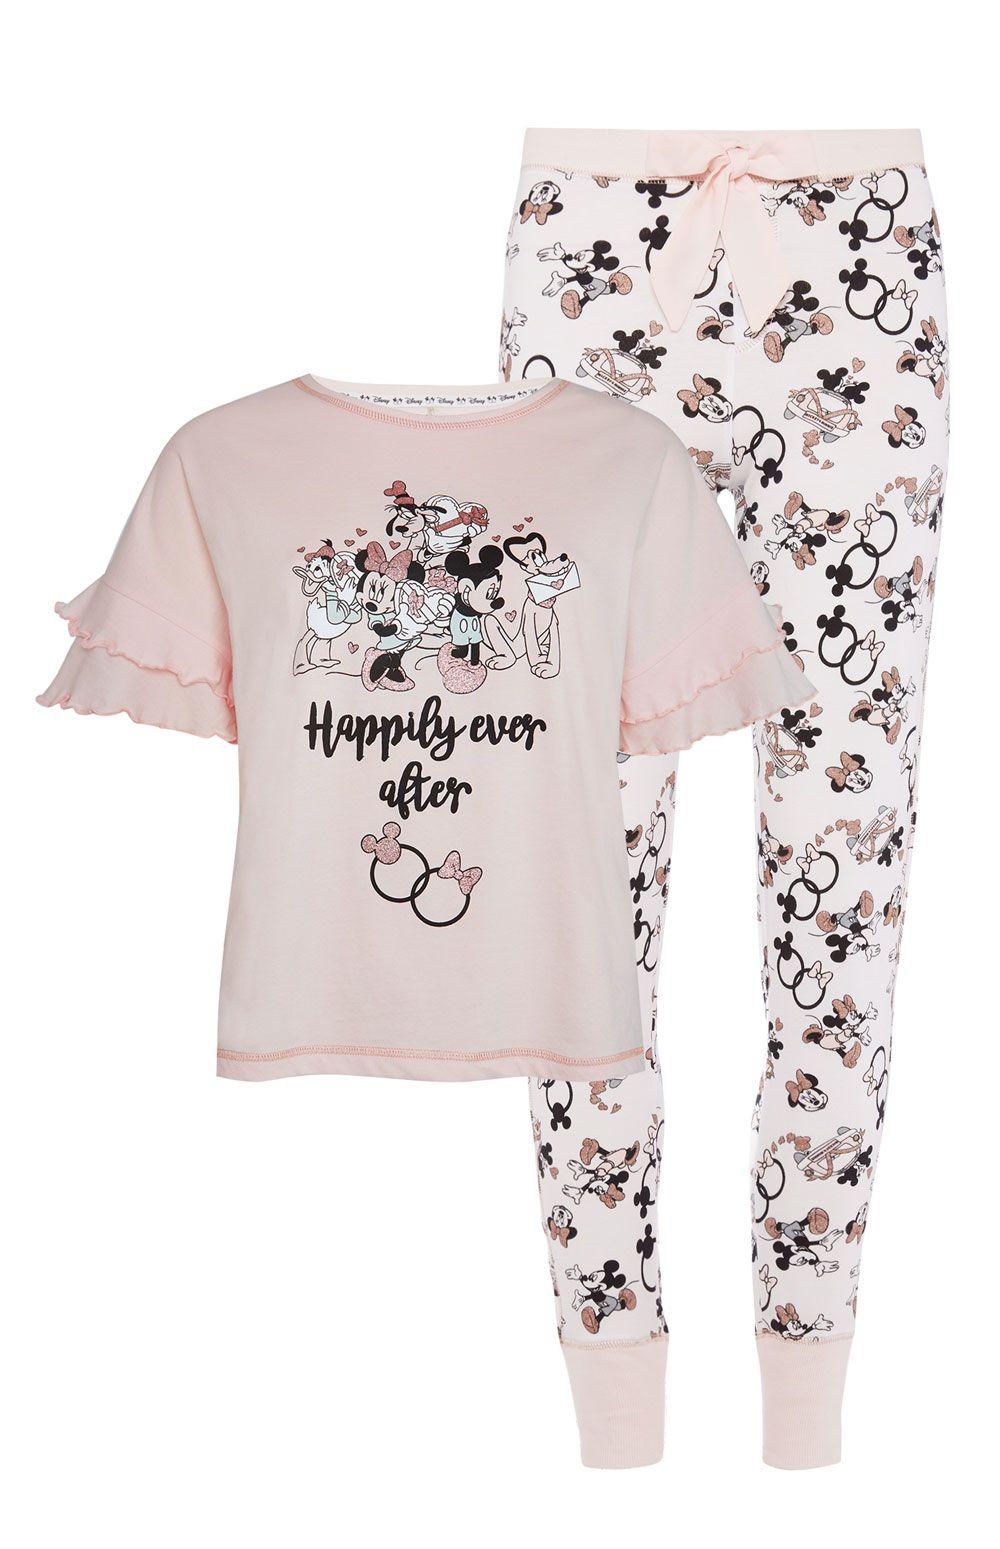 Femmes Primark Disney Mickey Mouse Sequin T-Shirt Pyjama Nightwear pyjama BNWT.